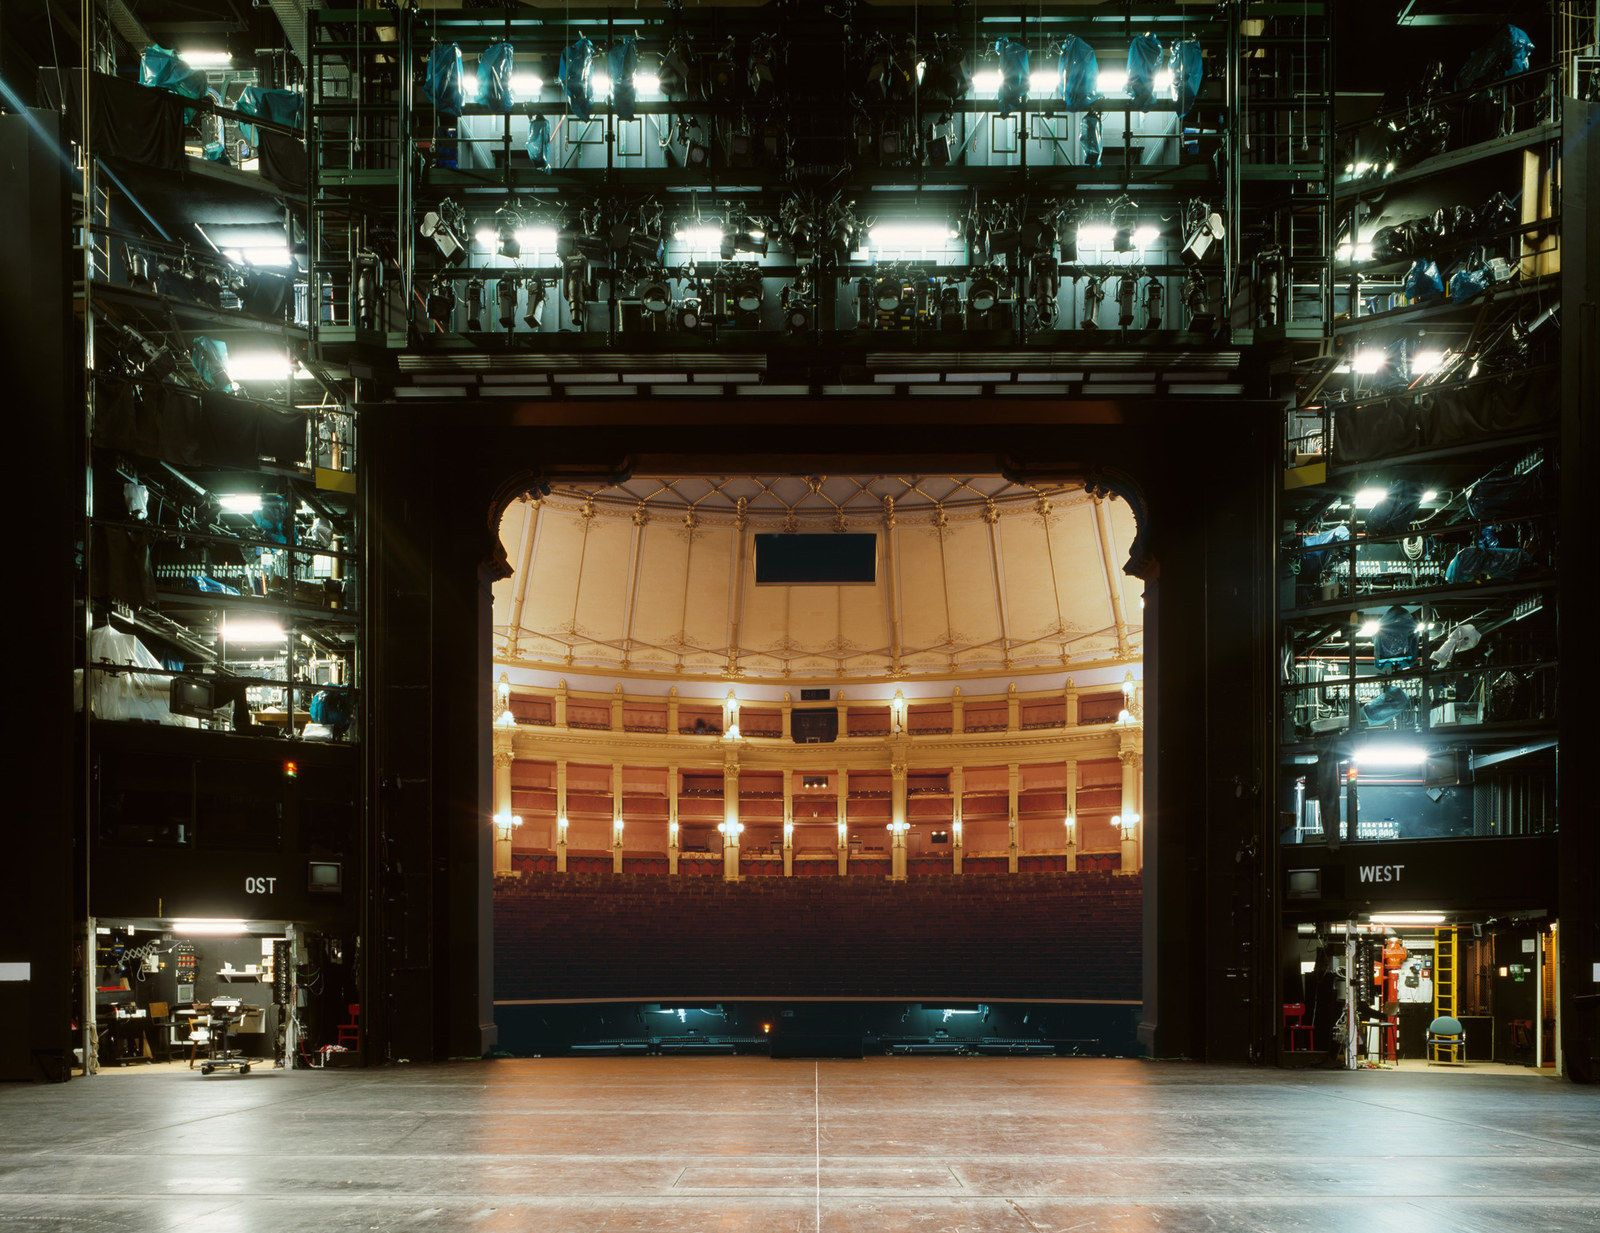 Teatro Del Festival De Bayreuth (Bayreuther Festspielhaus), Bayreuth